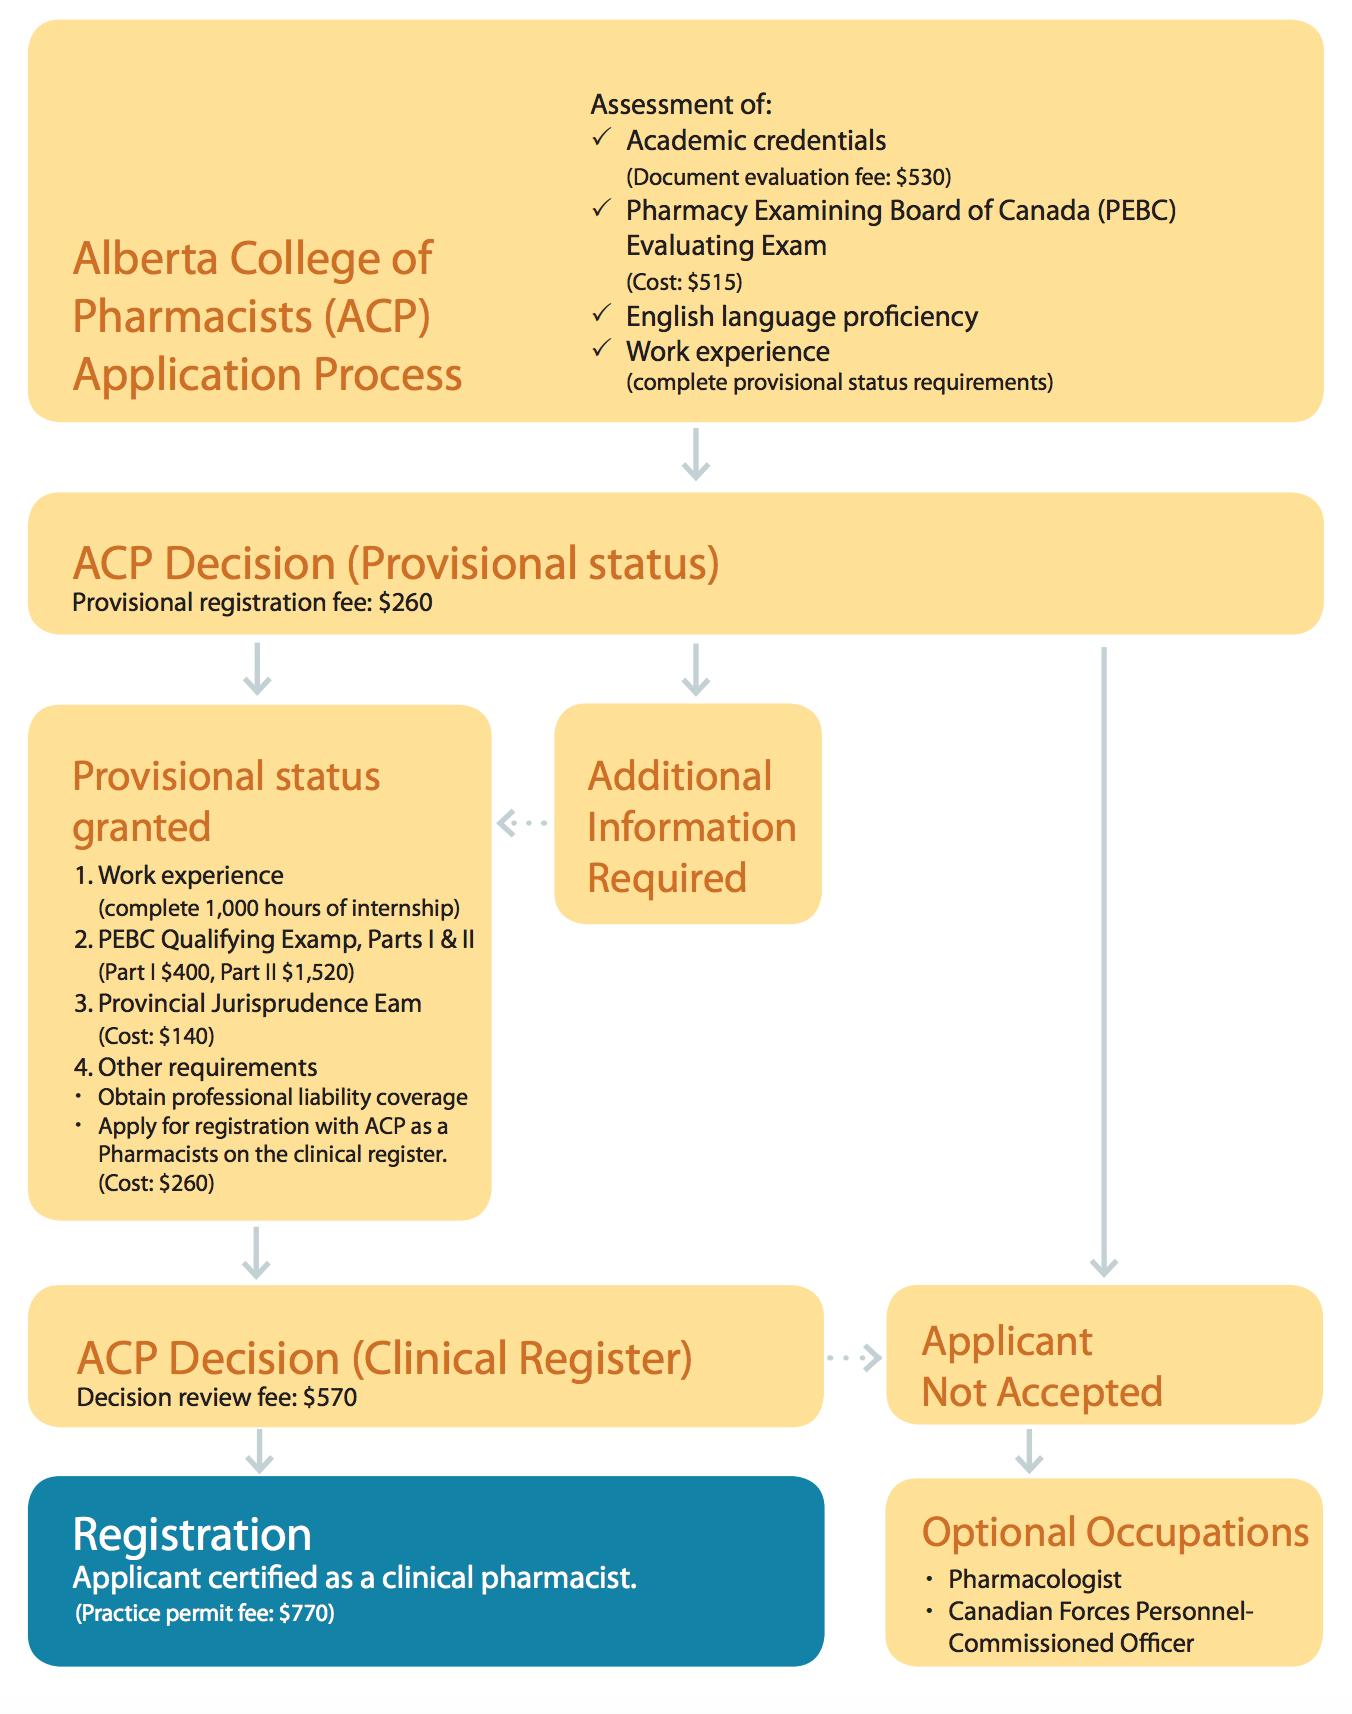 PEBC Exam for Alberta province